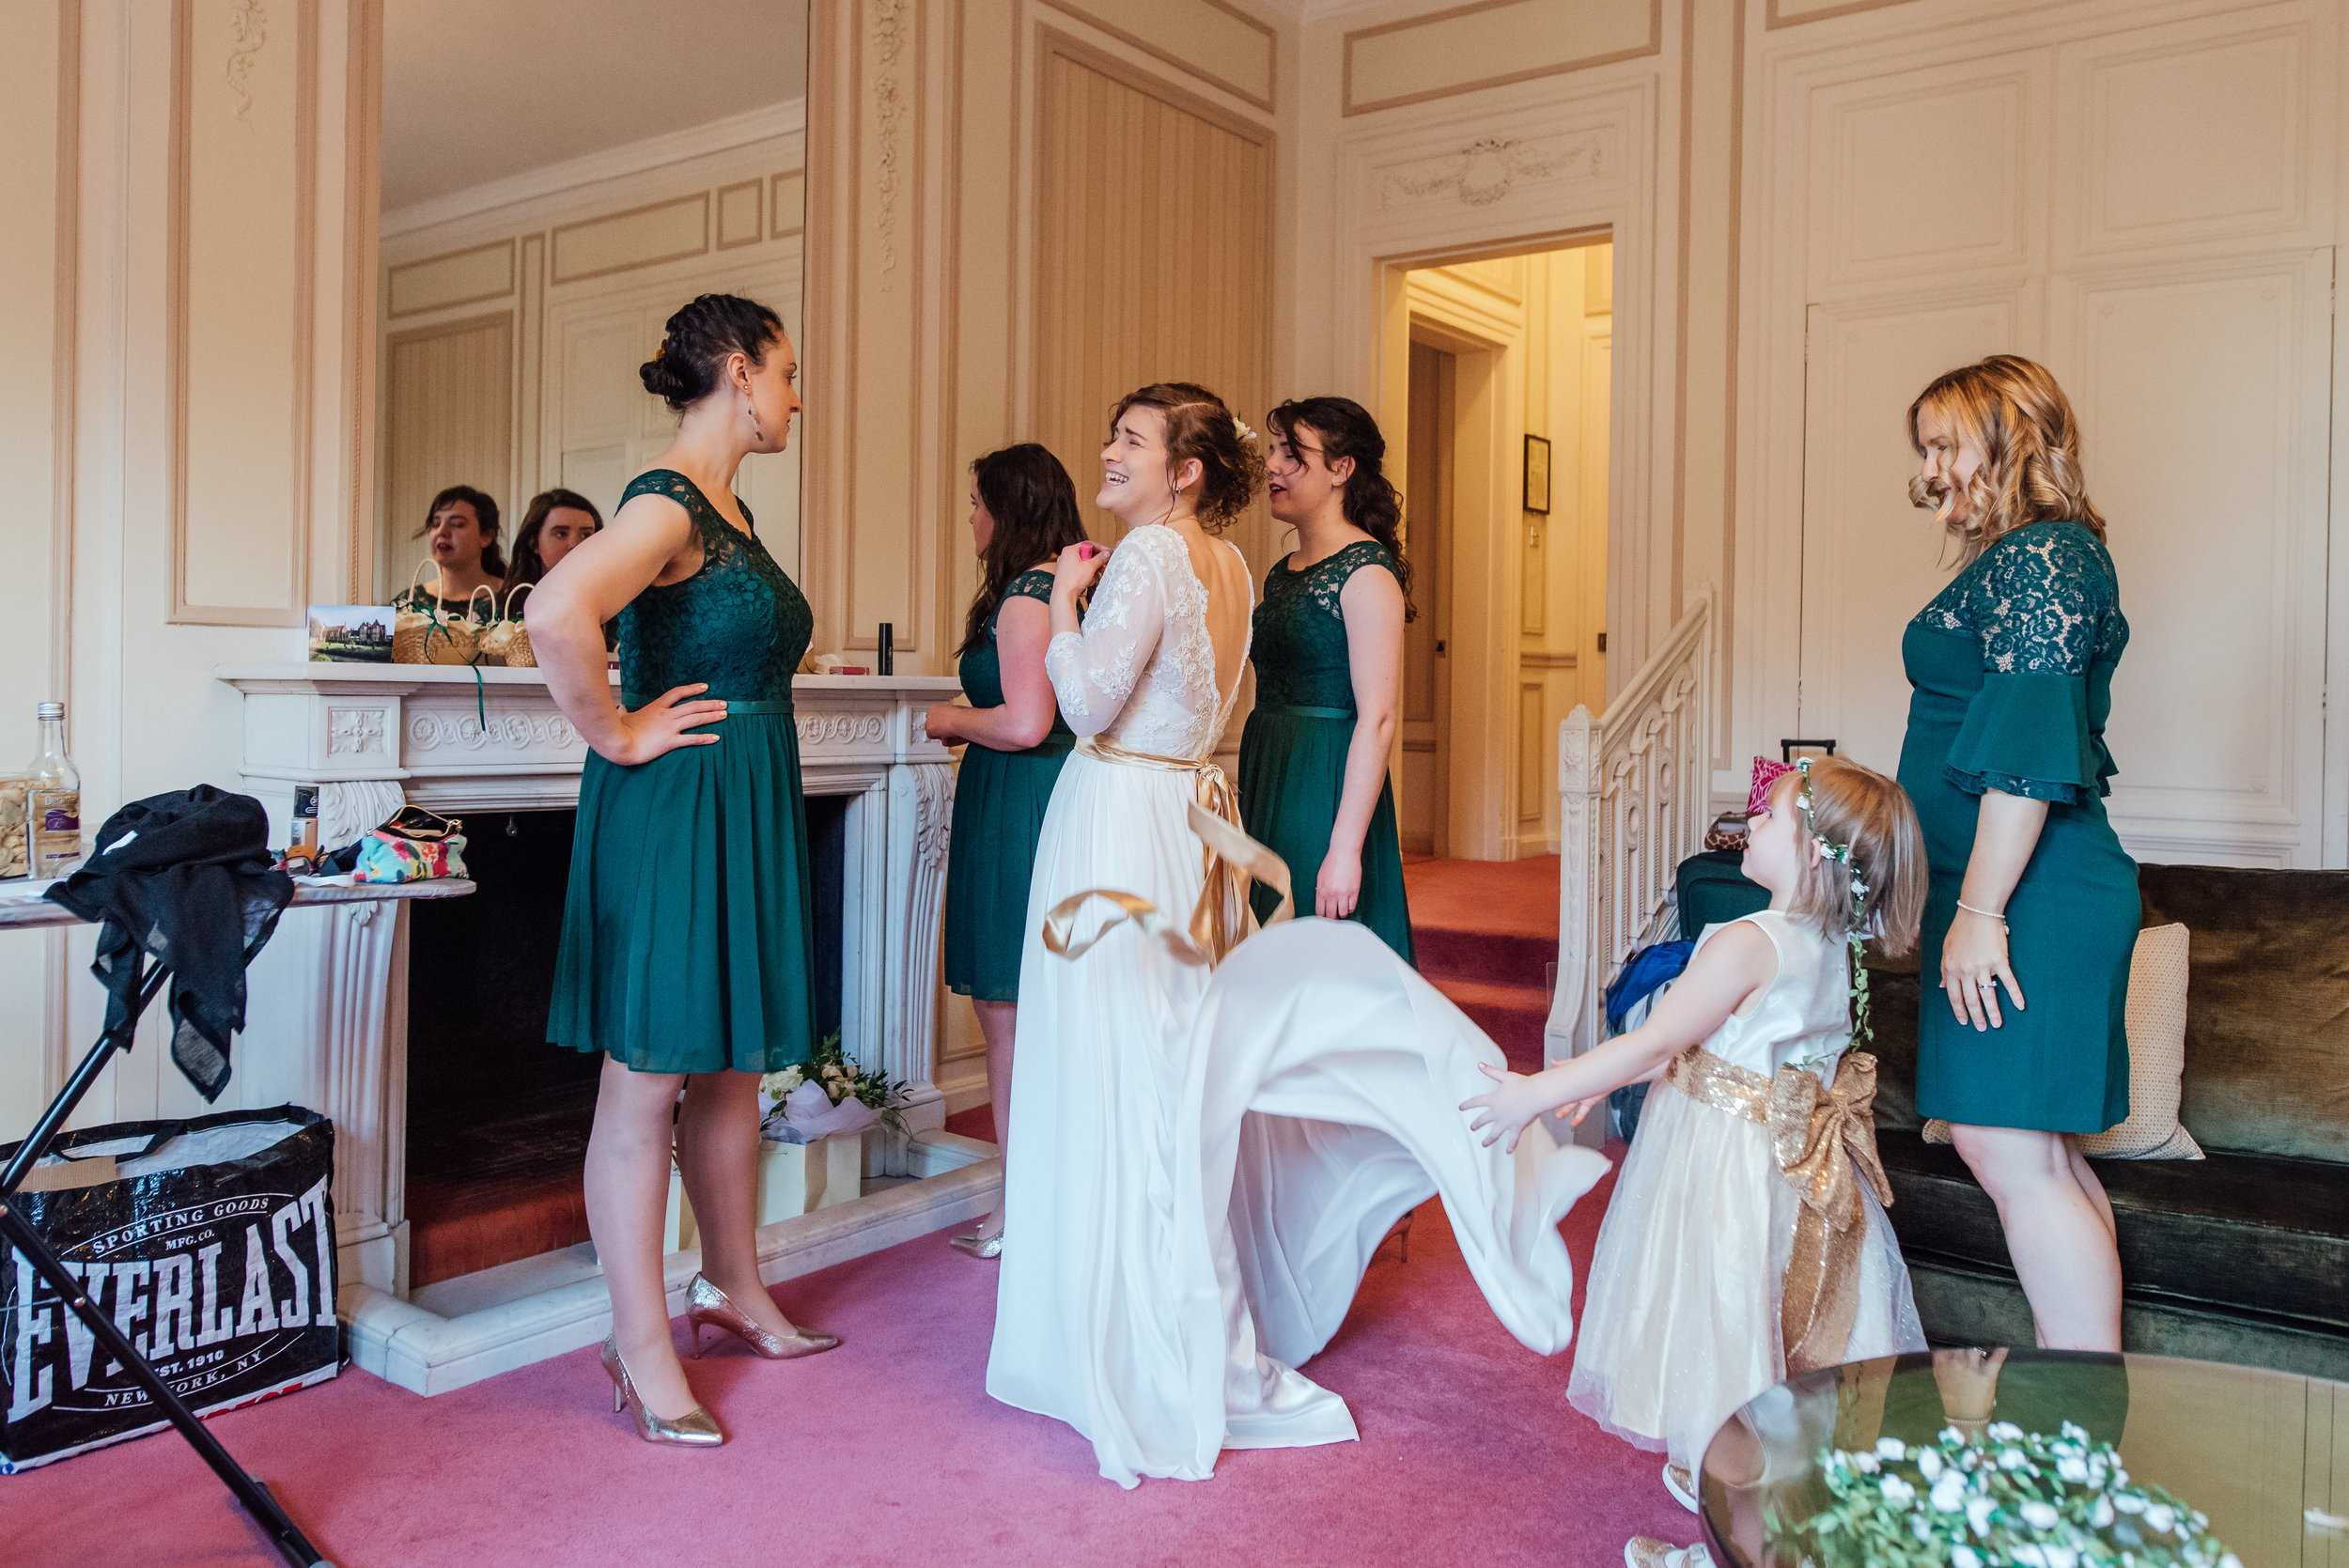 Hampshire-wedding-photographer-hampshire / Amy-James-photography / wellington-college-wedding-berkshire /hampshire-wedding-venue / Berkshire-wedding-venue / fleet-wedding-photographer-farnborough